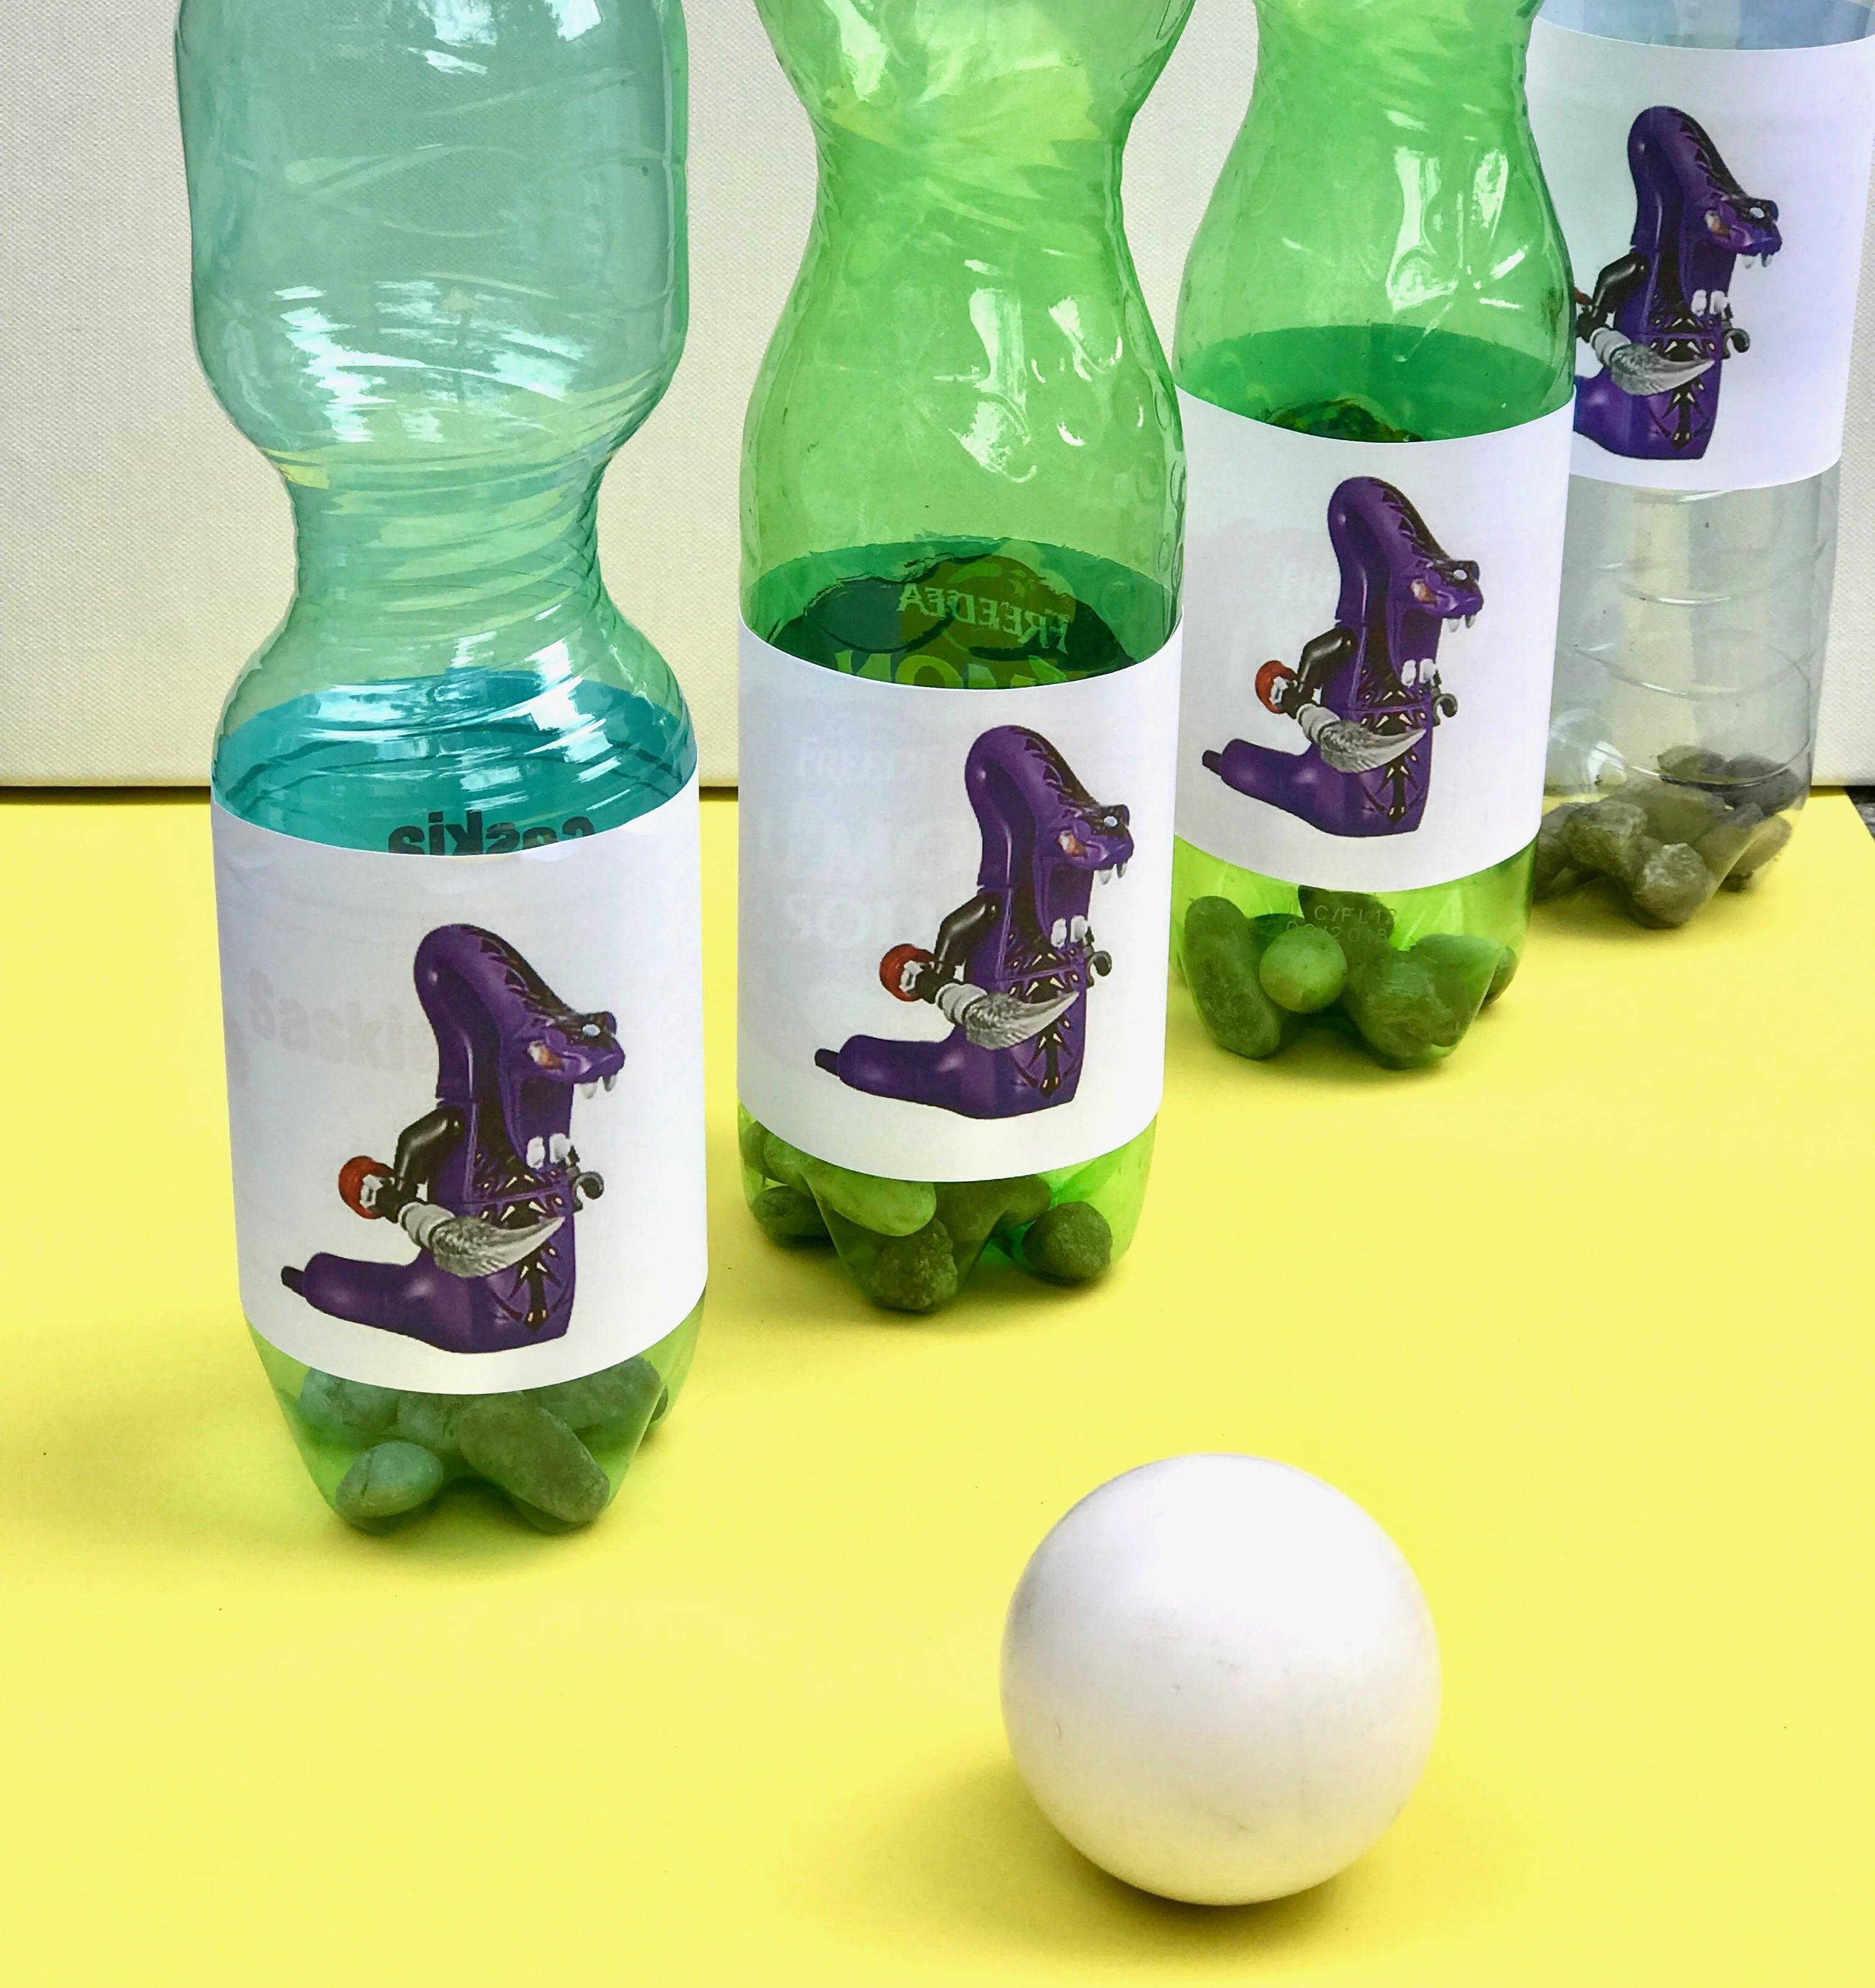 ninjago-geburtstag-spiel-idee-kegel-plastikflaschen-selbermachen-upcycling-kinder